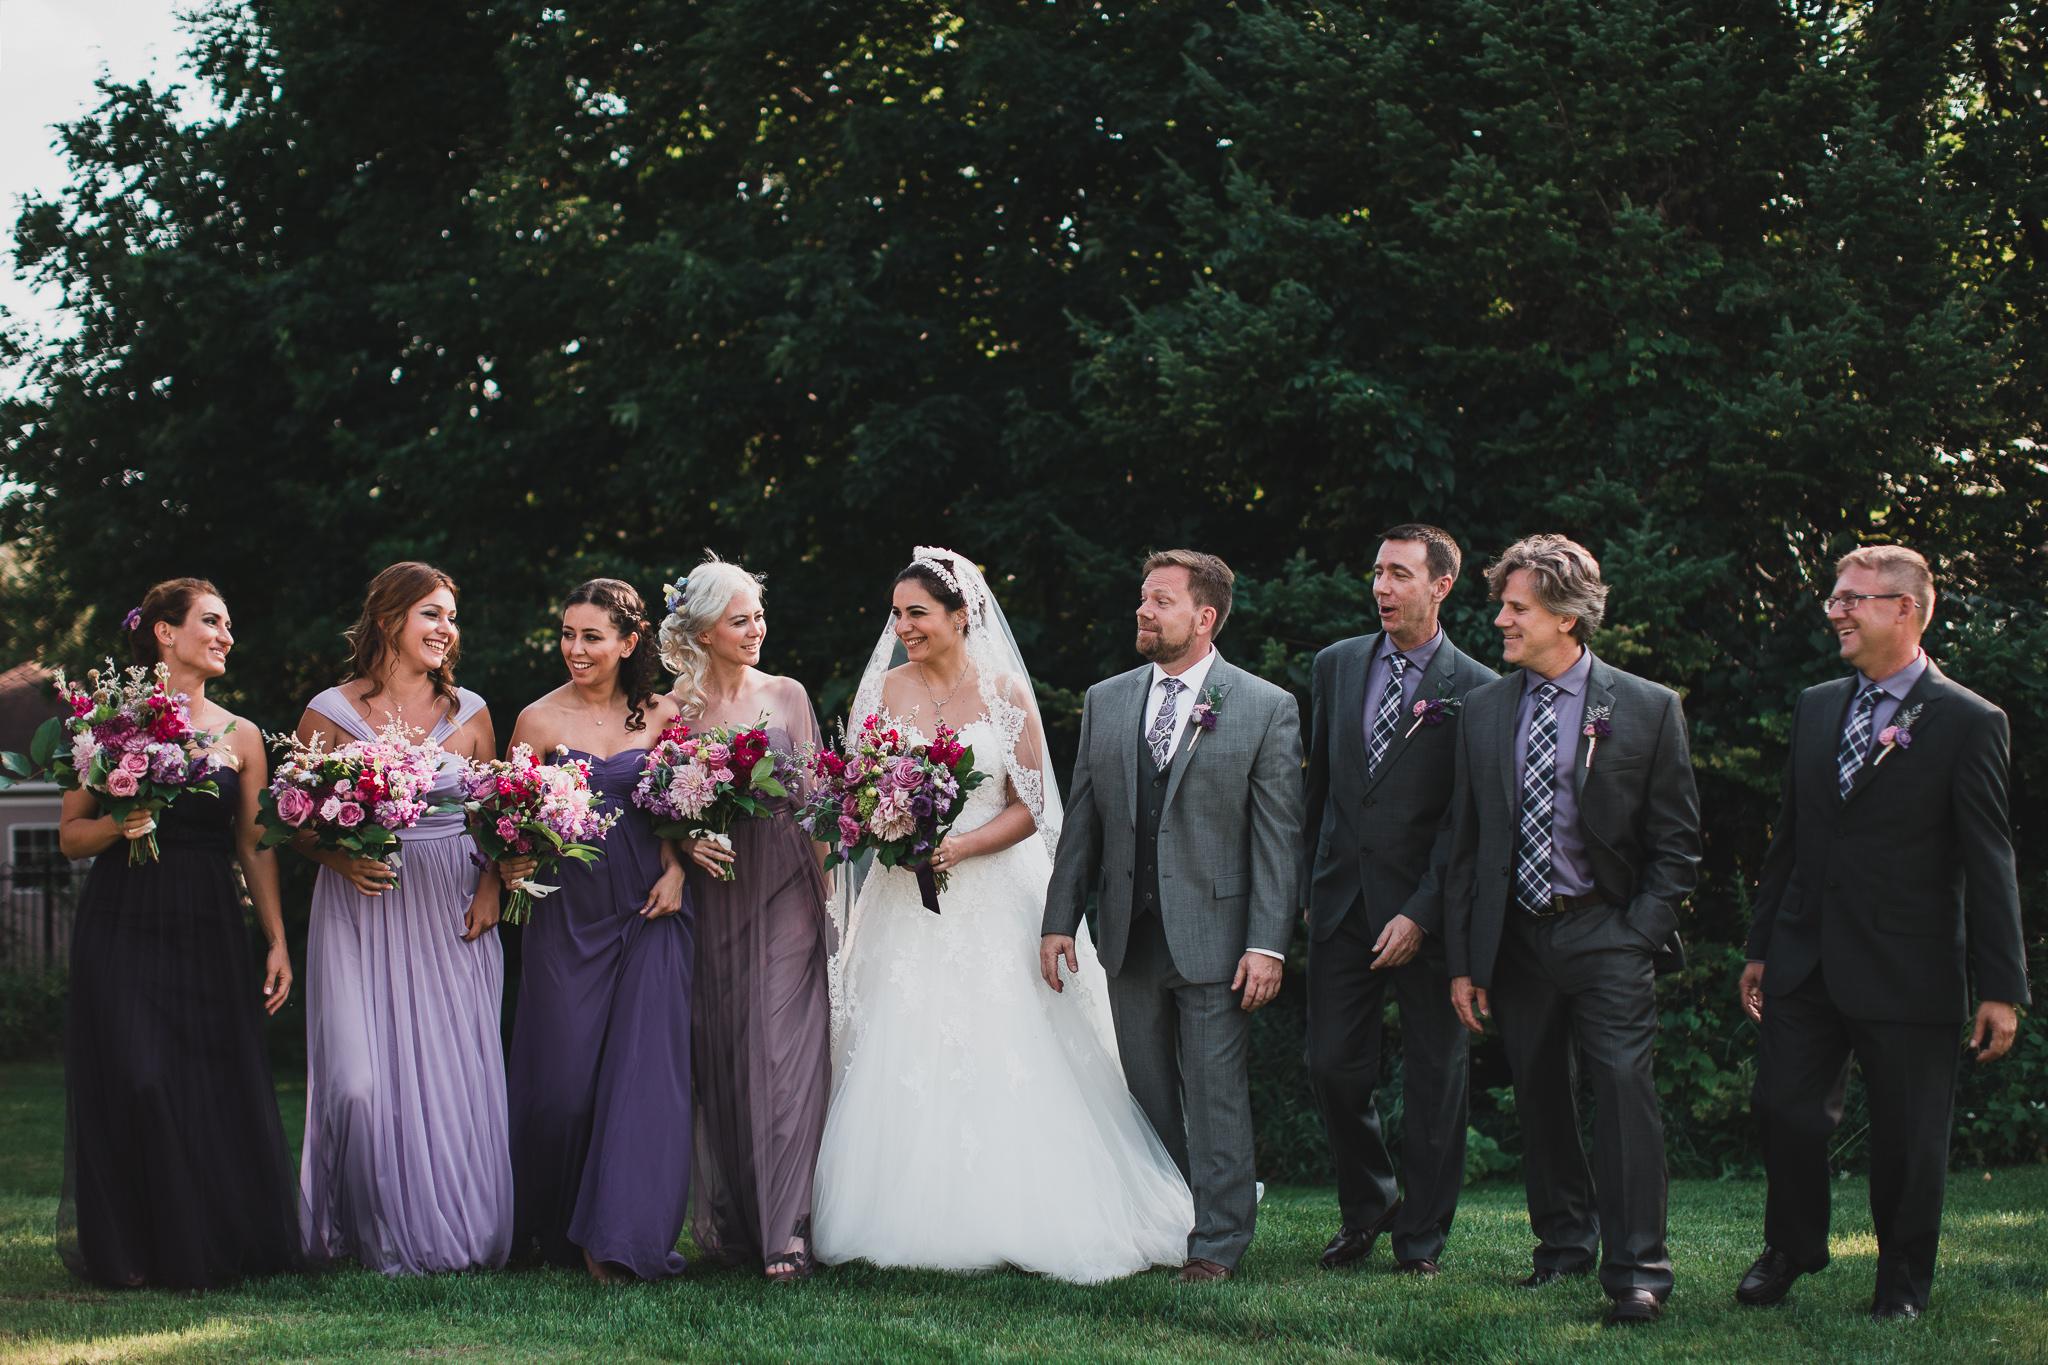 Satin & Snow Ottawa Wedding Planner